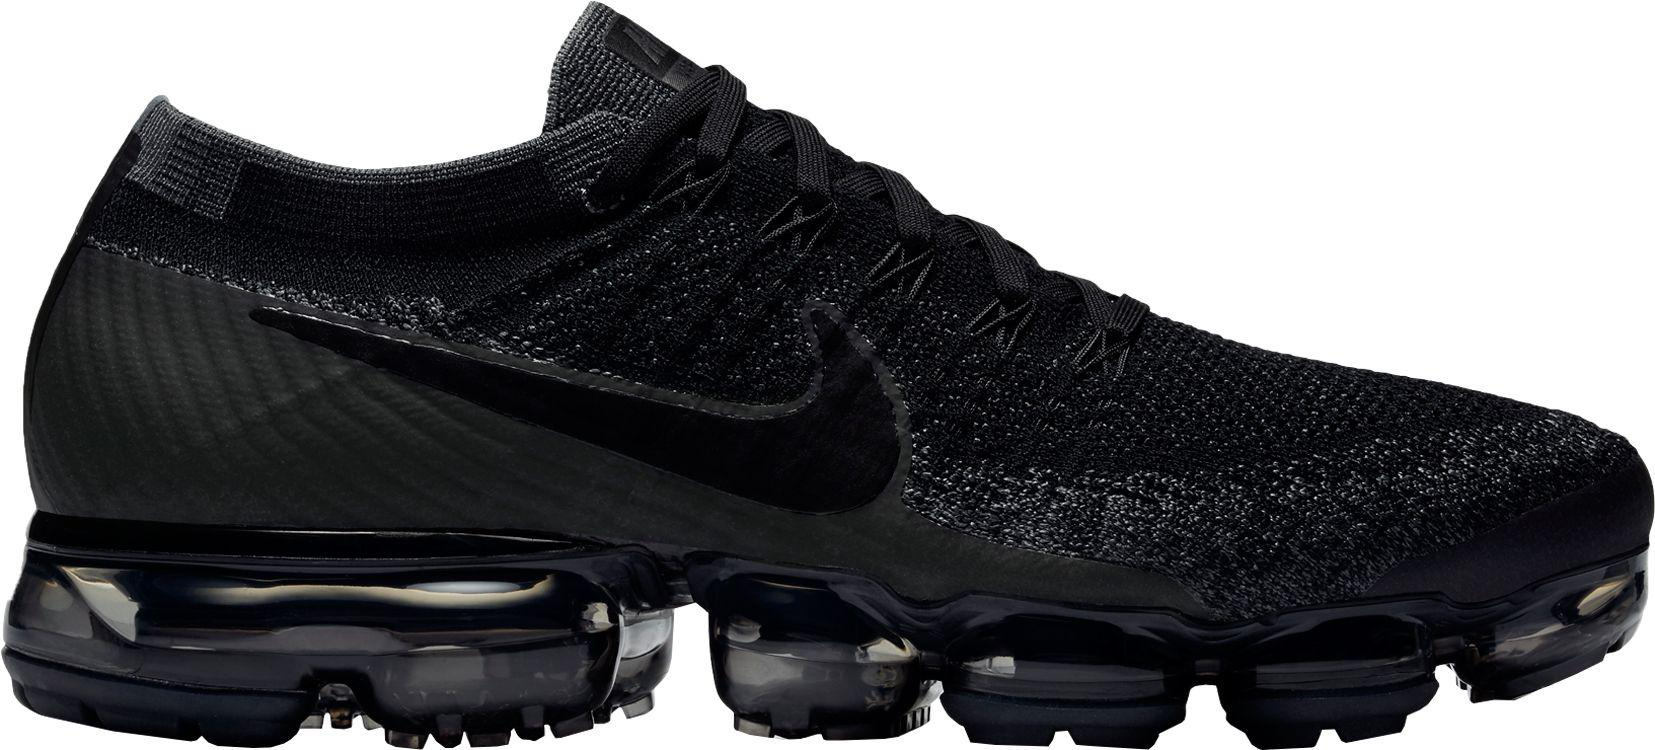 422b7743dd90e ... germany nike black air vapormax flyknit running shoes for men lyst  fde11 9790b